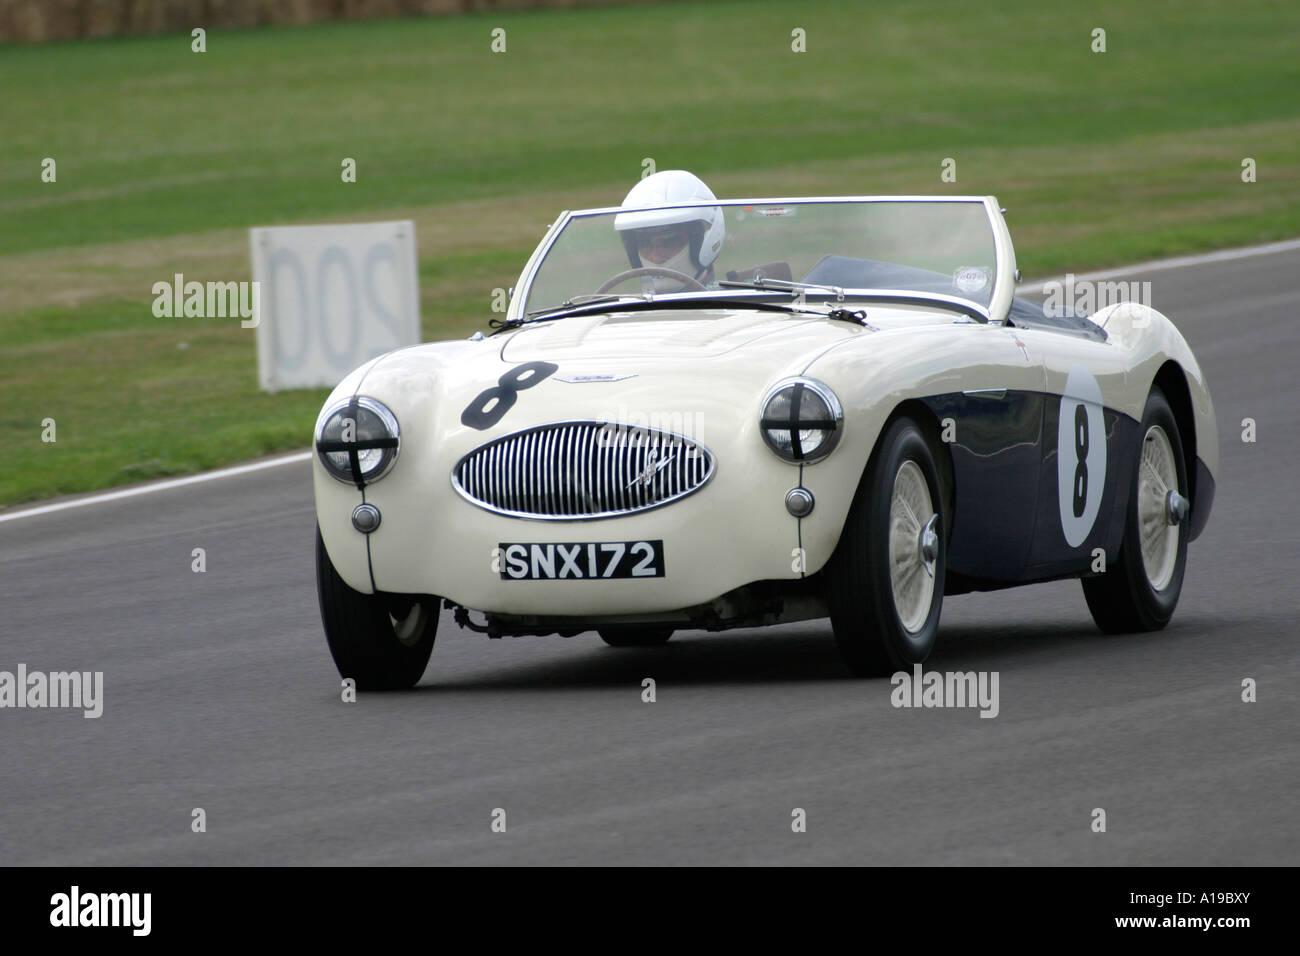 1955 Austin-Healey 100 s am Goodwood Revival, Sussex, England. Stockbild